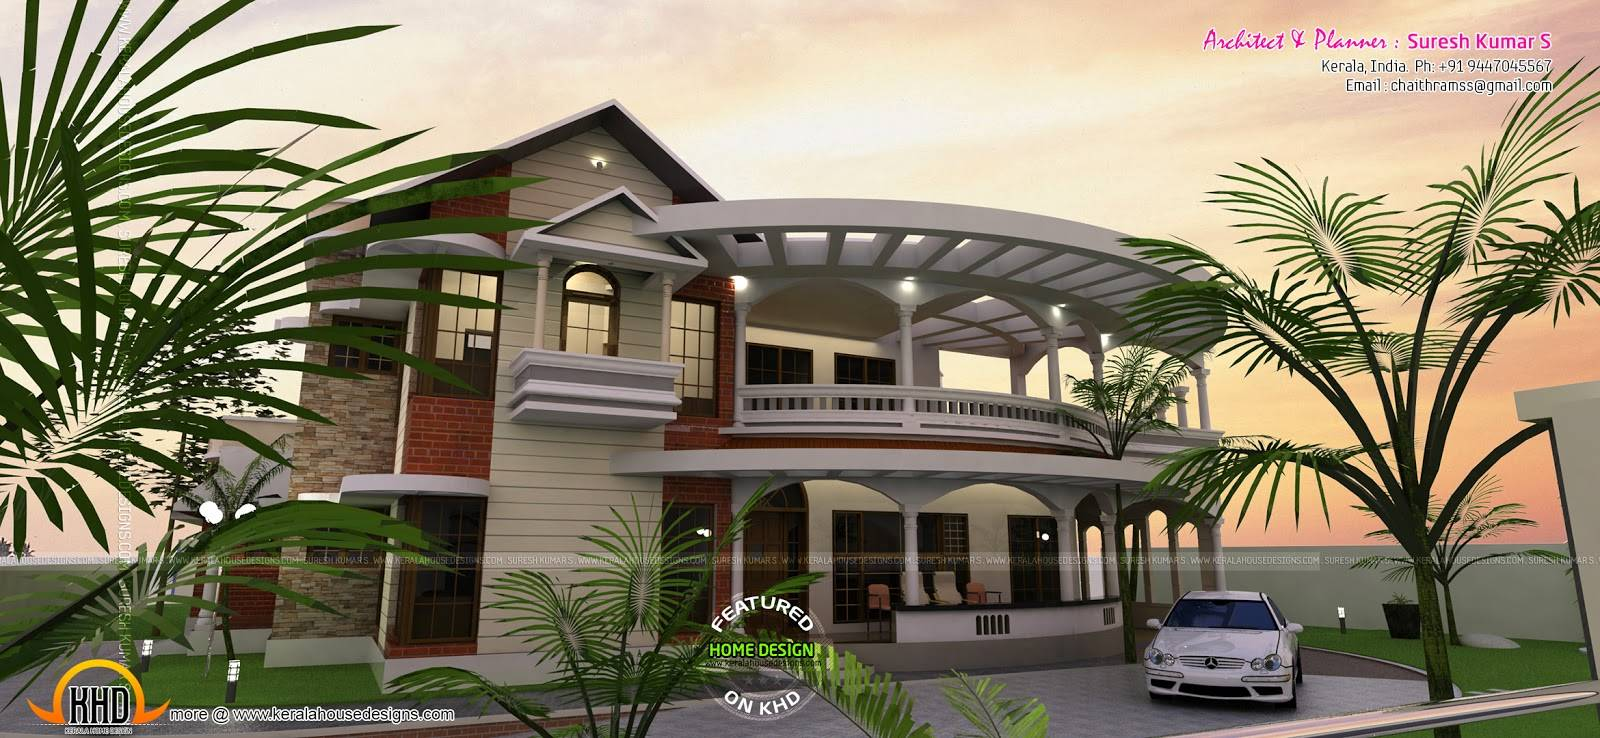 Great Looking House Design Suresh Kumar Modern Interior Designs